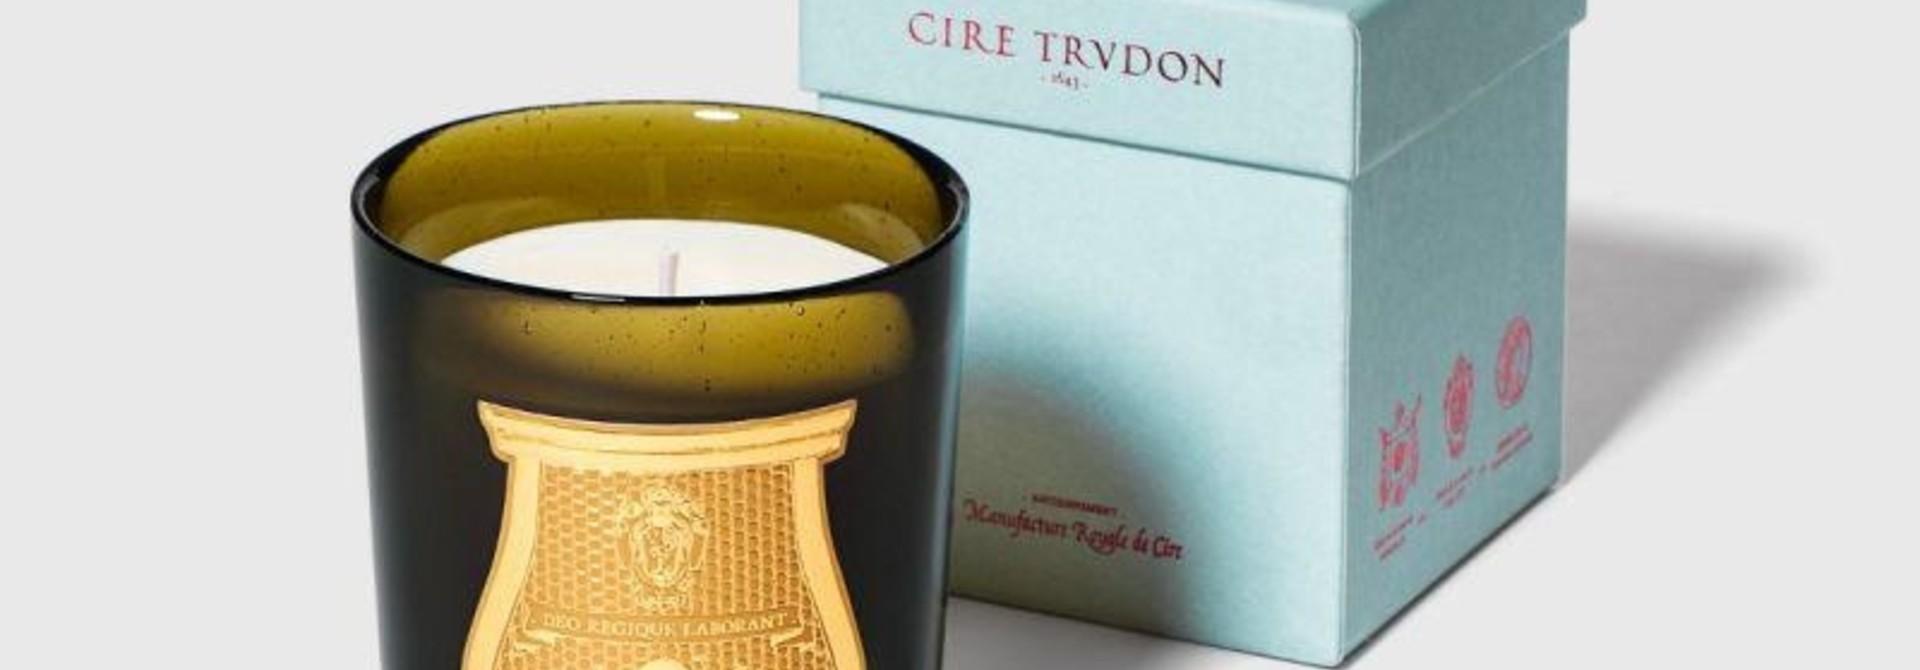 CIRE TRUDON - Candle Admirable 270gr